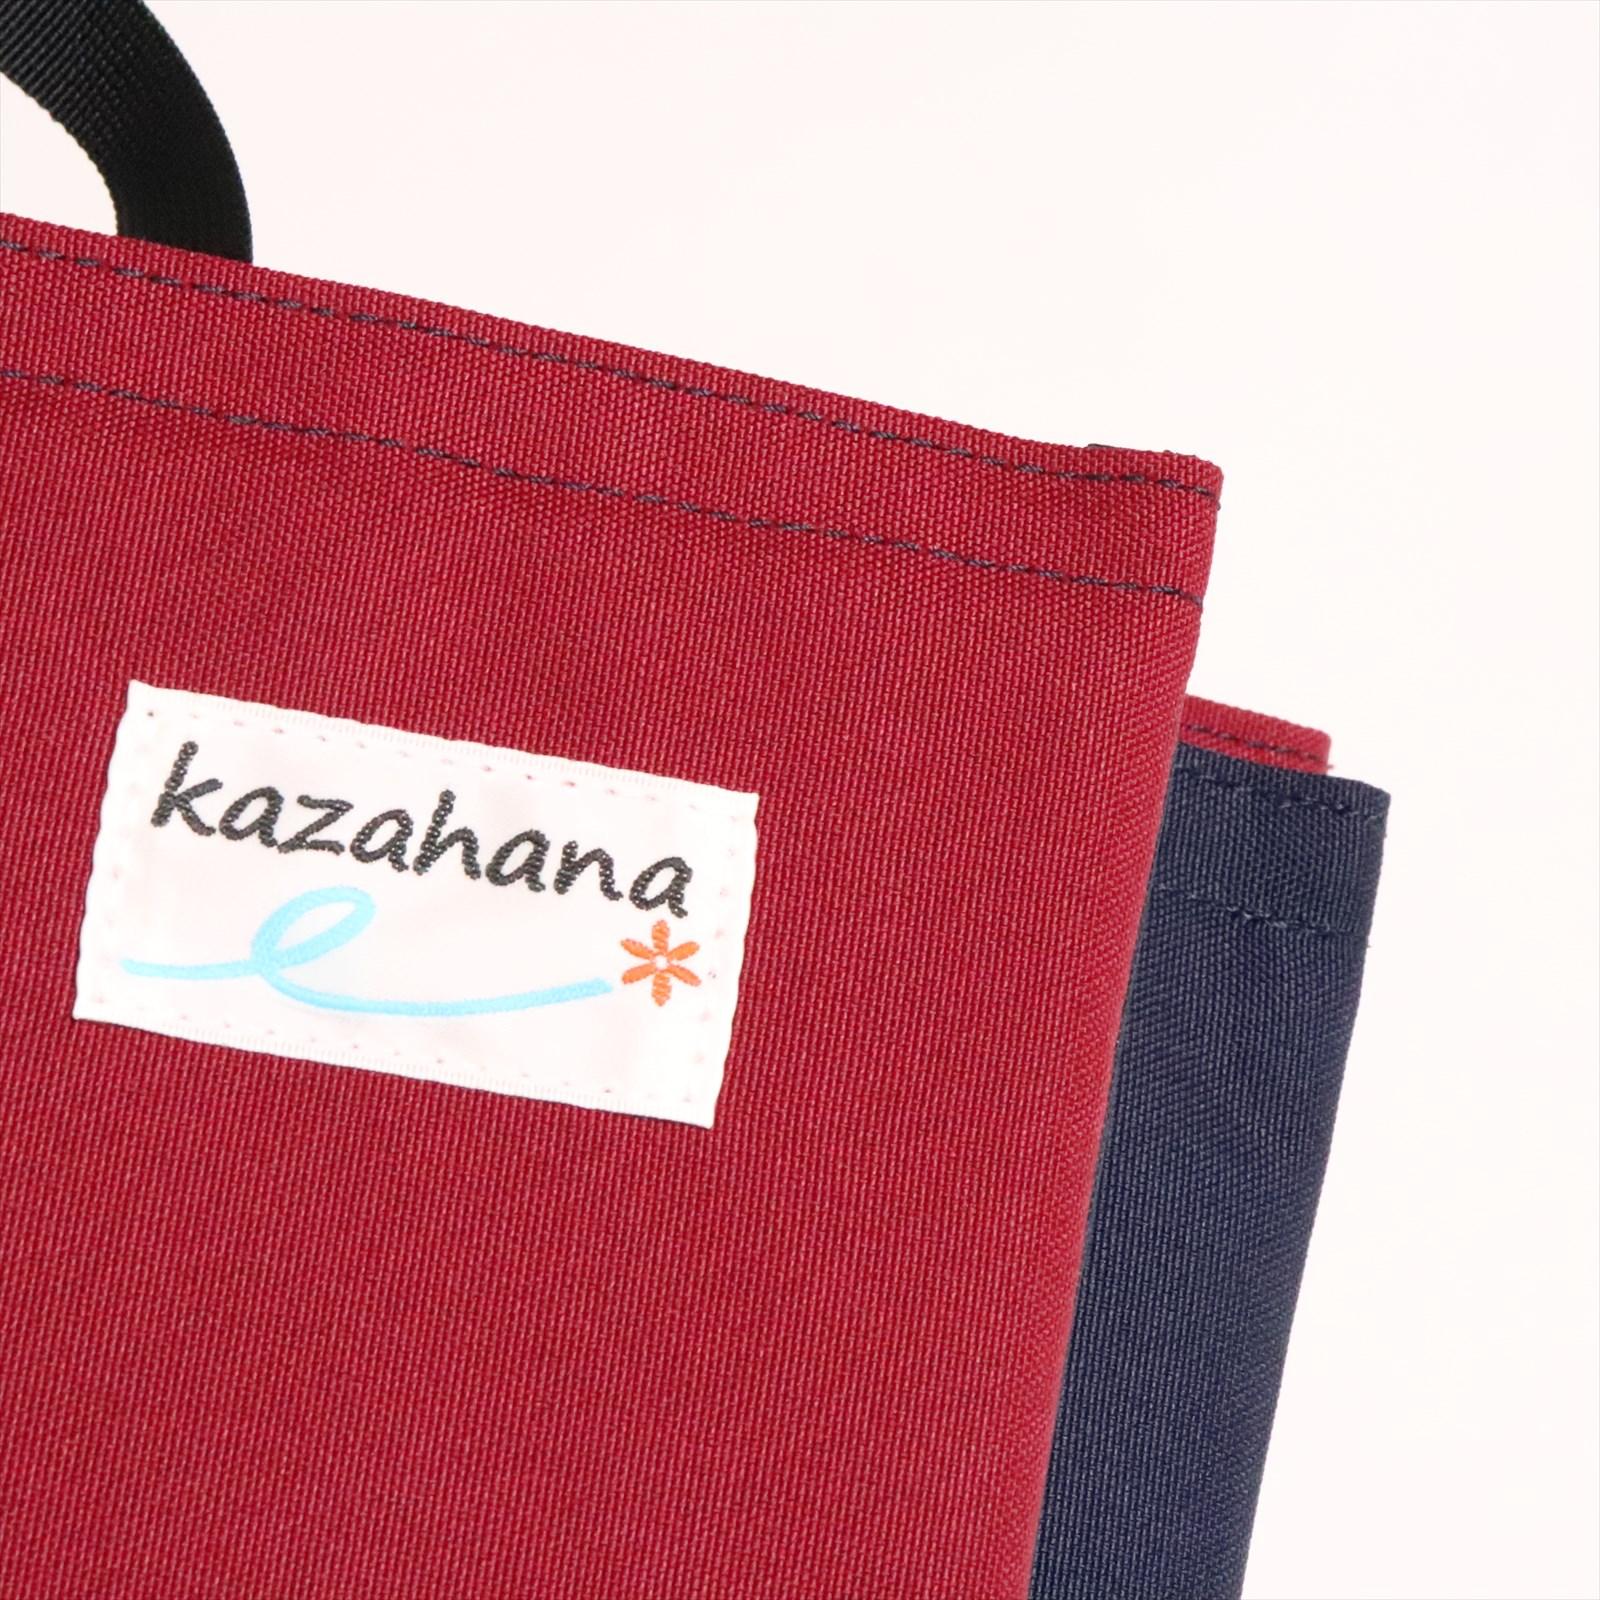 kazahana カザハナ finder pad ファインダーパッド ネイビー×ワイン 「店頭受取ポイントUP商品」ポイント700Pプレゼント